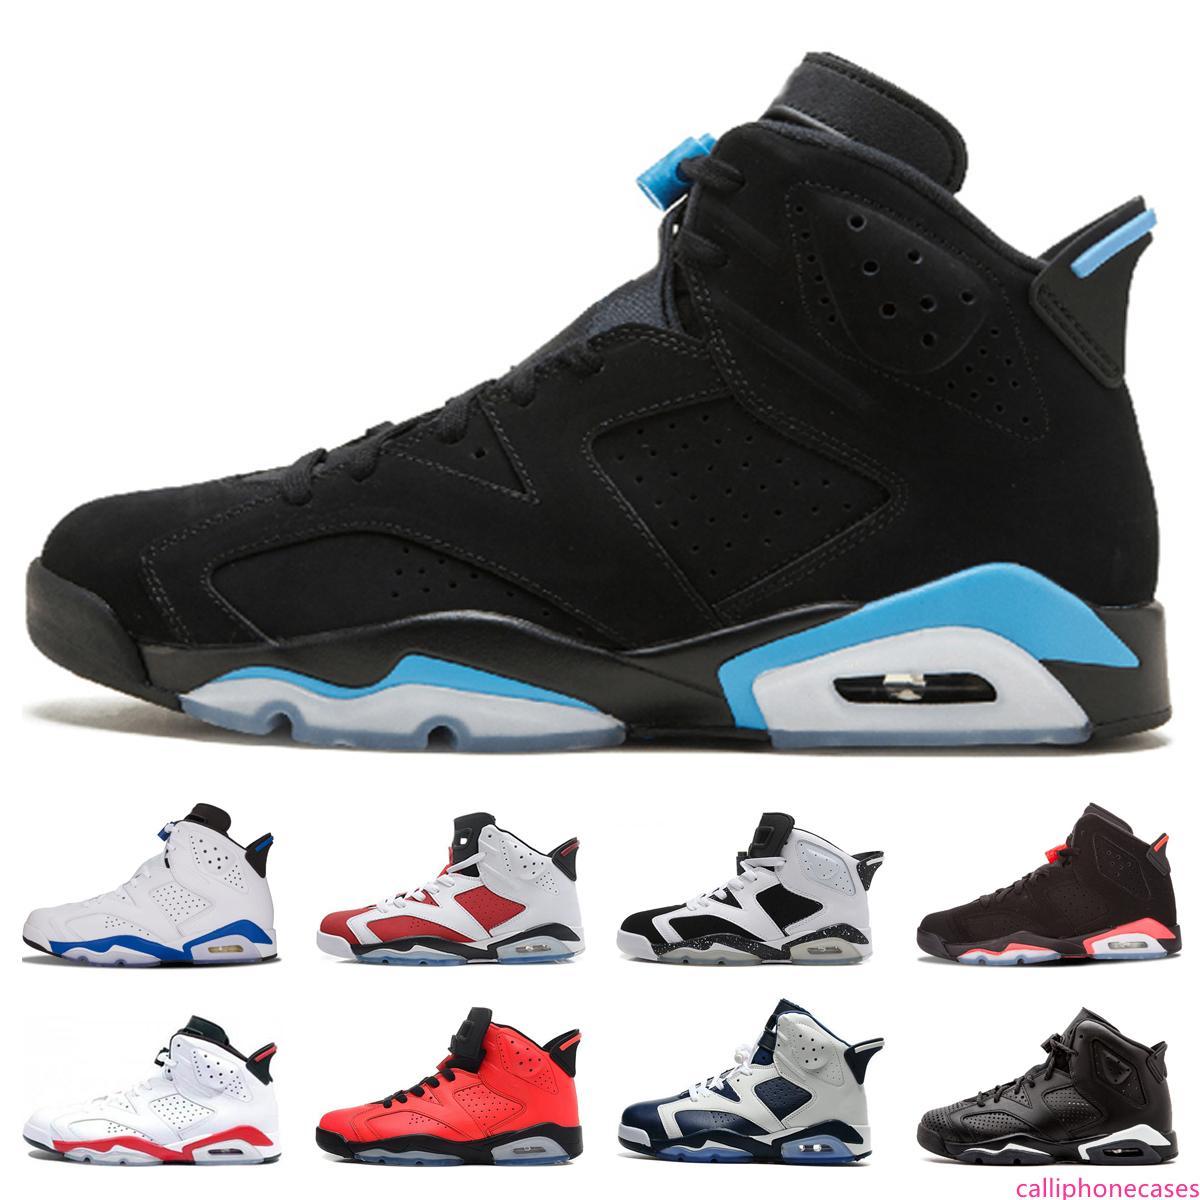 Hot 6 UNC Mens Basketball Shoes 6s Infrared Black Cat Angry bull Alternate Olympic Oreo Carmine Sport Blue 2019 Designer Athletics Sneakers